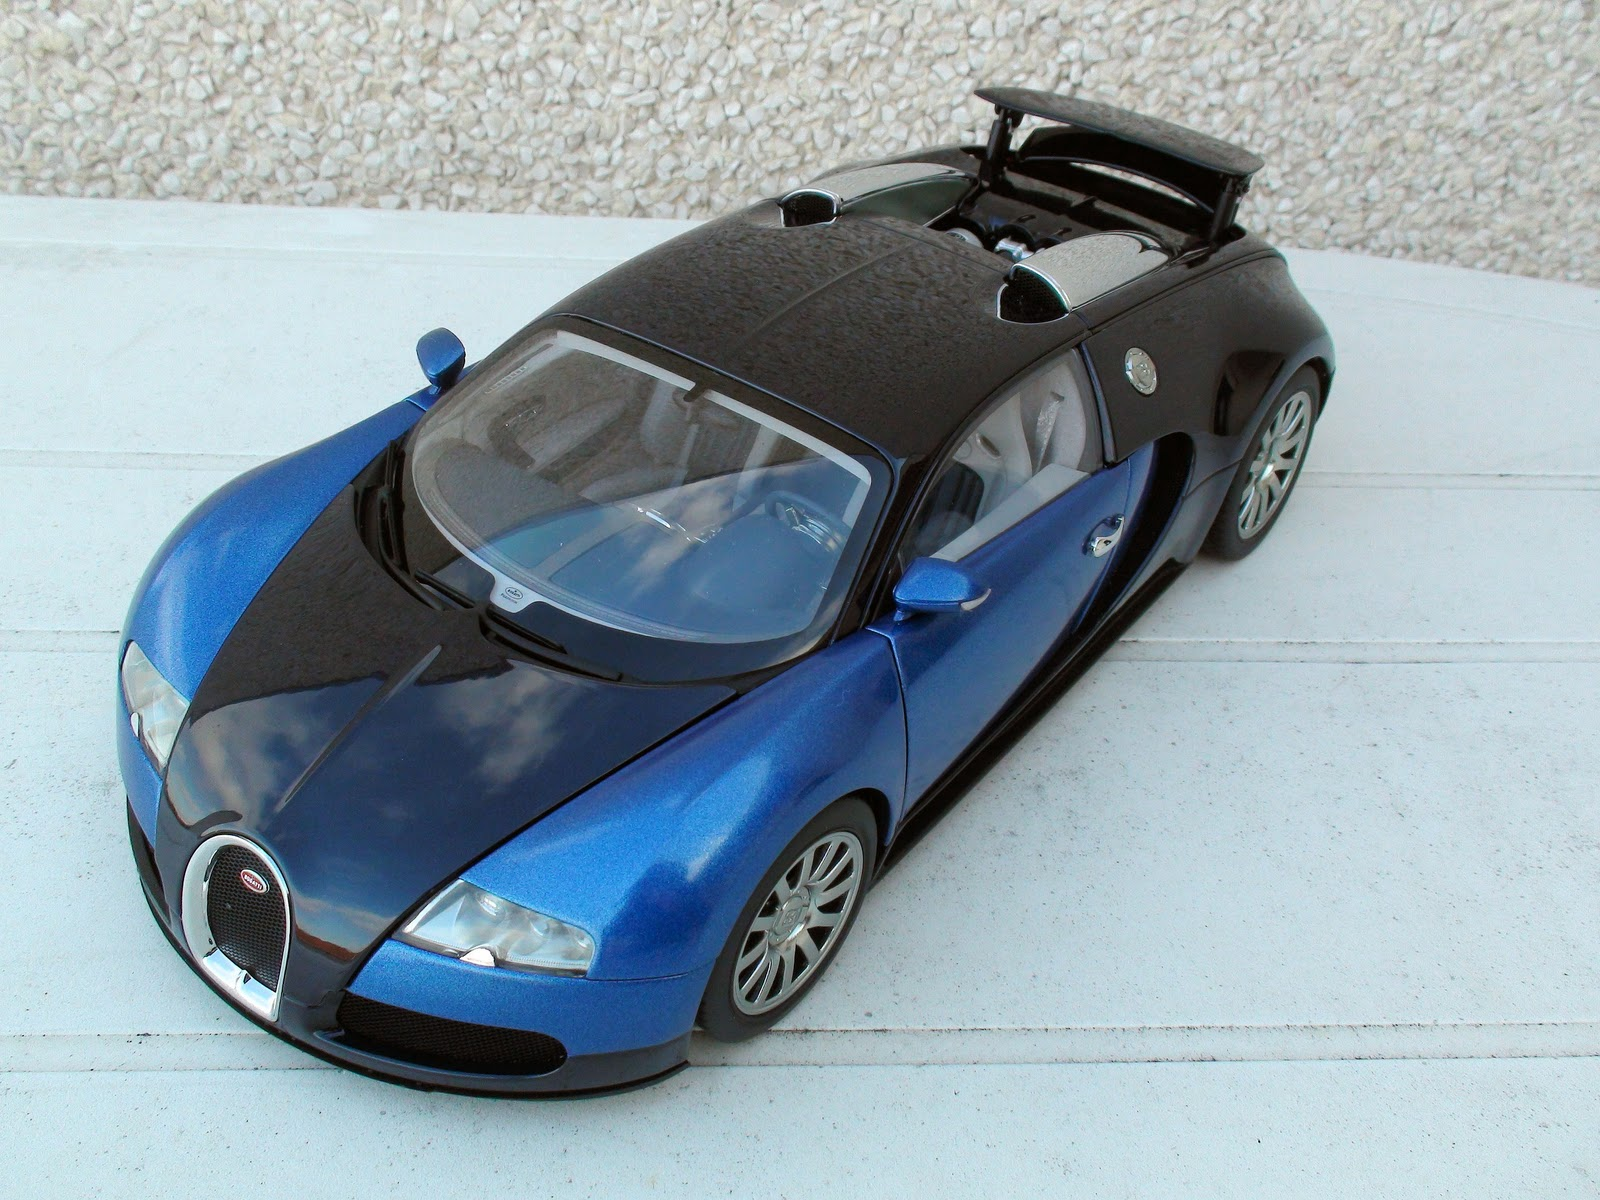 pseudo cars bugatti eb 16 4 veyron production car 2006. Black Bedroom Furniture Sets. Home Design Ideas